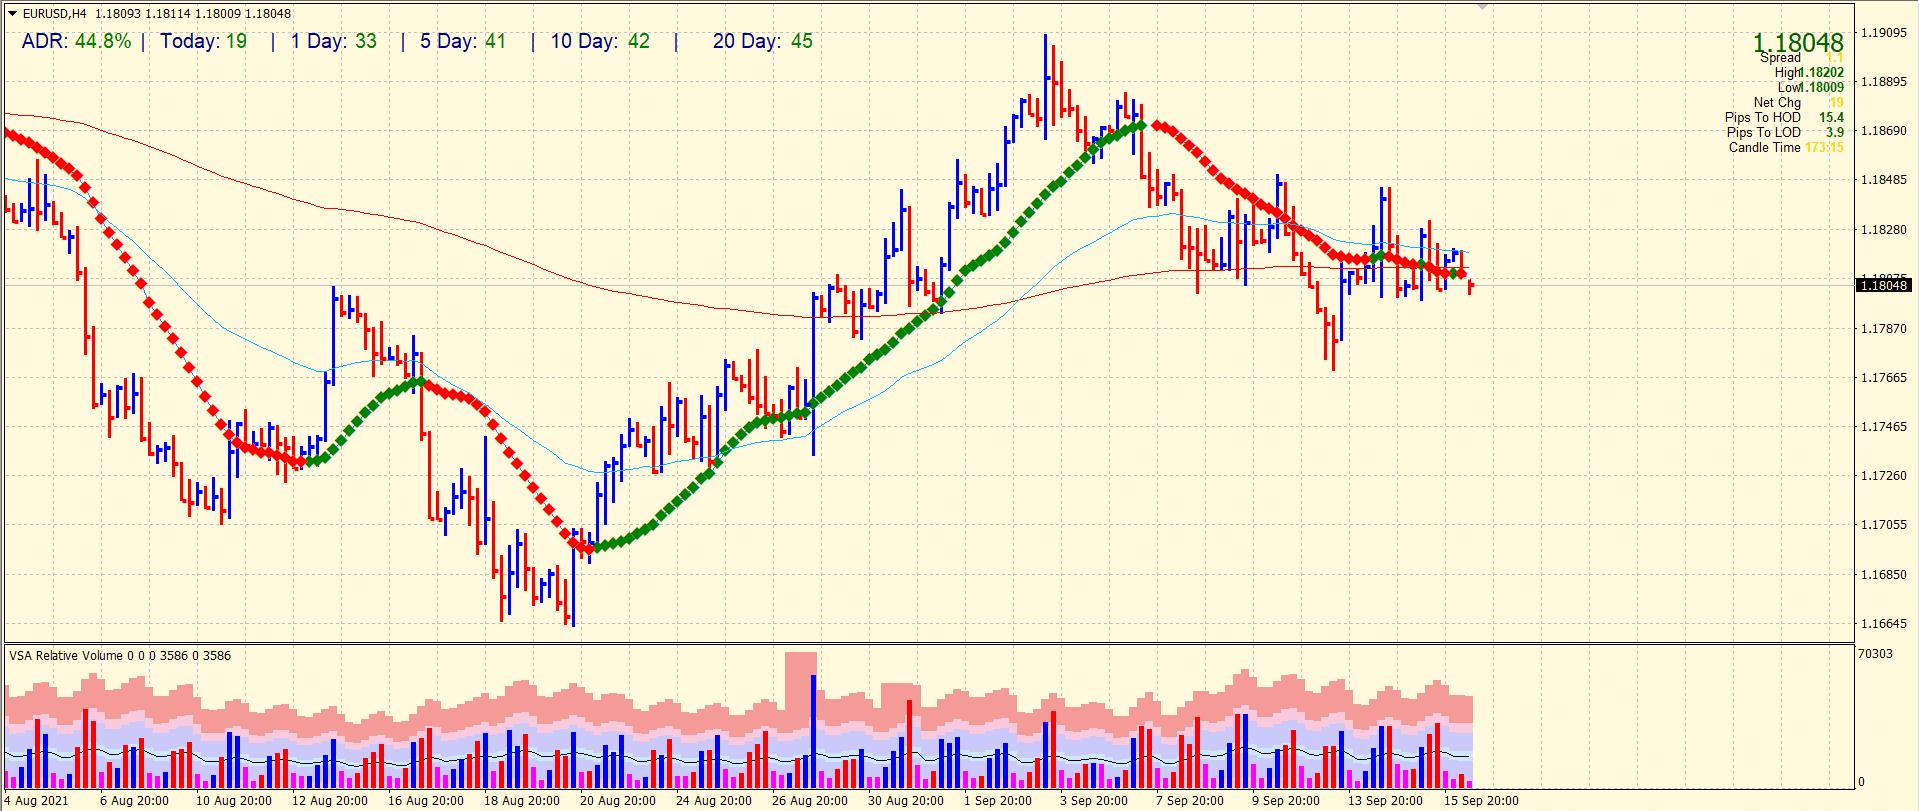 EUR/USD 4-hour price chart analysis